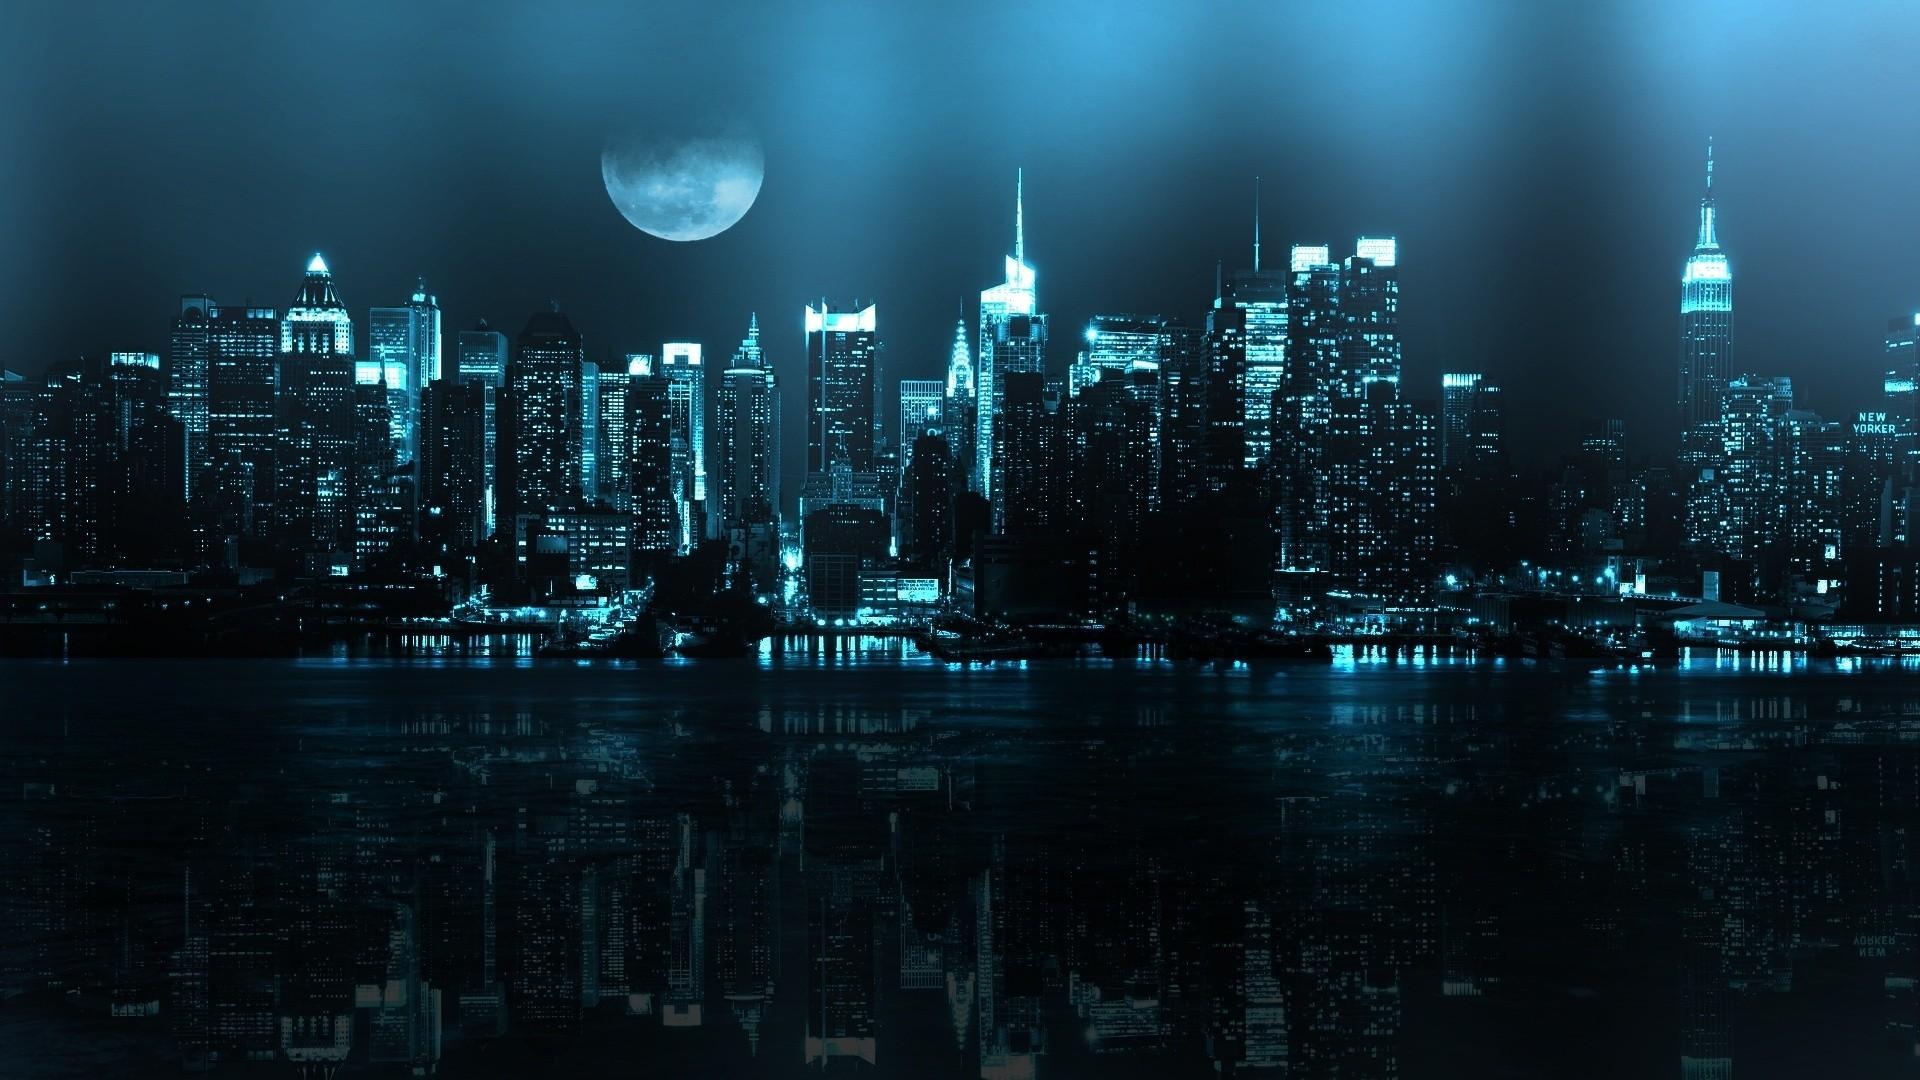 Wallpaper Digital Art Dark City Cityscape Night Reflection Moon Skyline Skyscraper New York City Horizon Dusk Metropolis Darkness Computer Wallpaper Atmosphere Of Earth Black And White Monochrome Photography Human Settlement 1920x1080